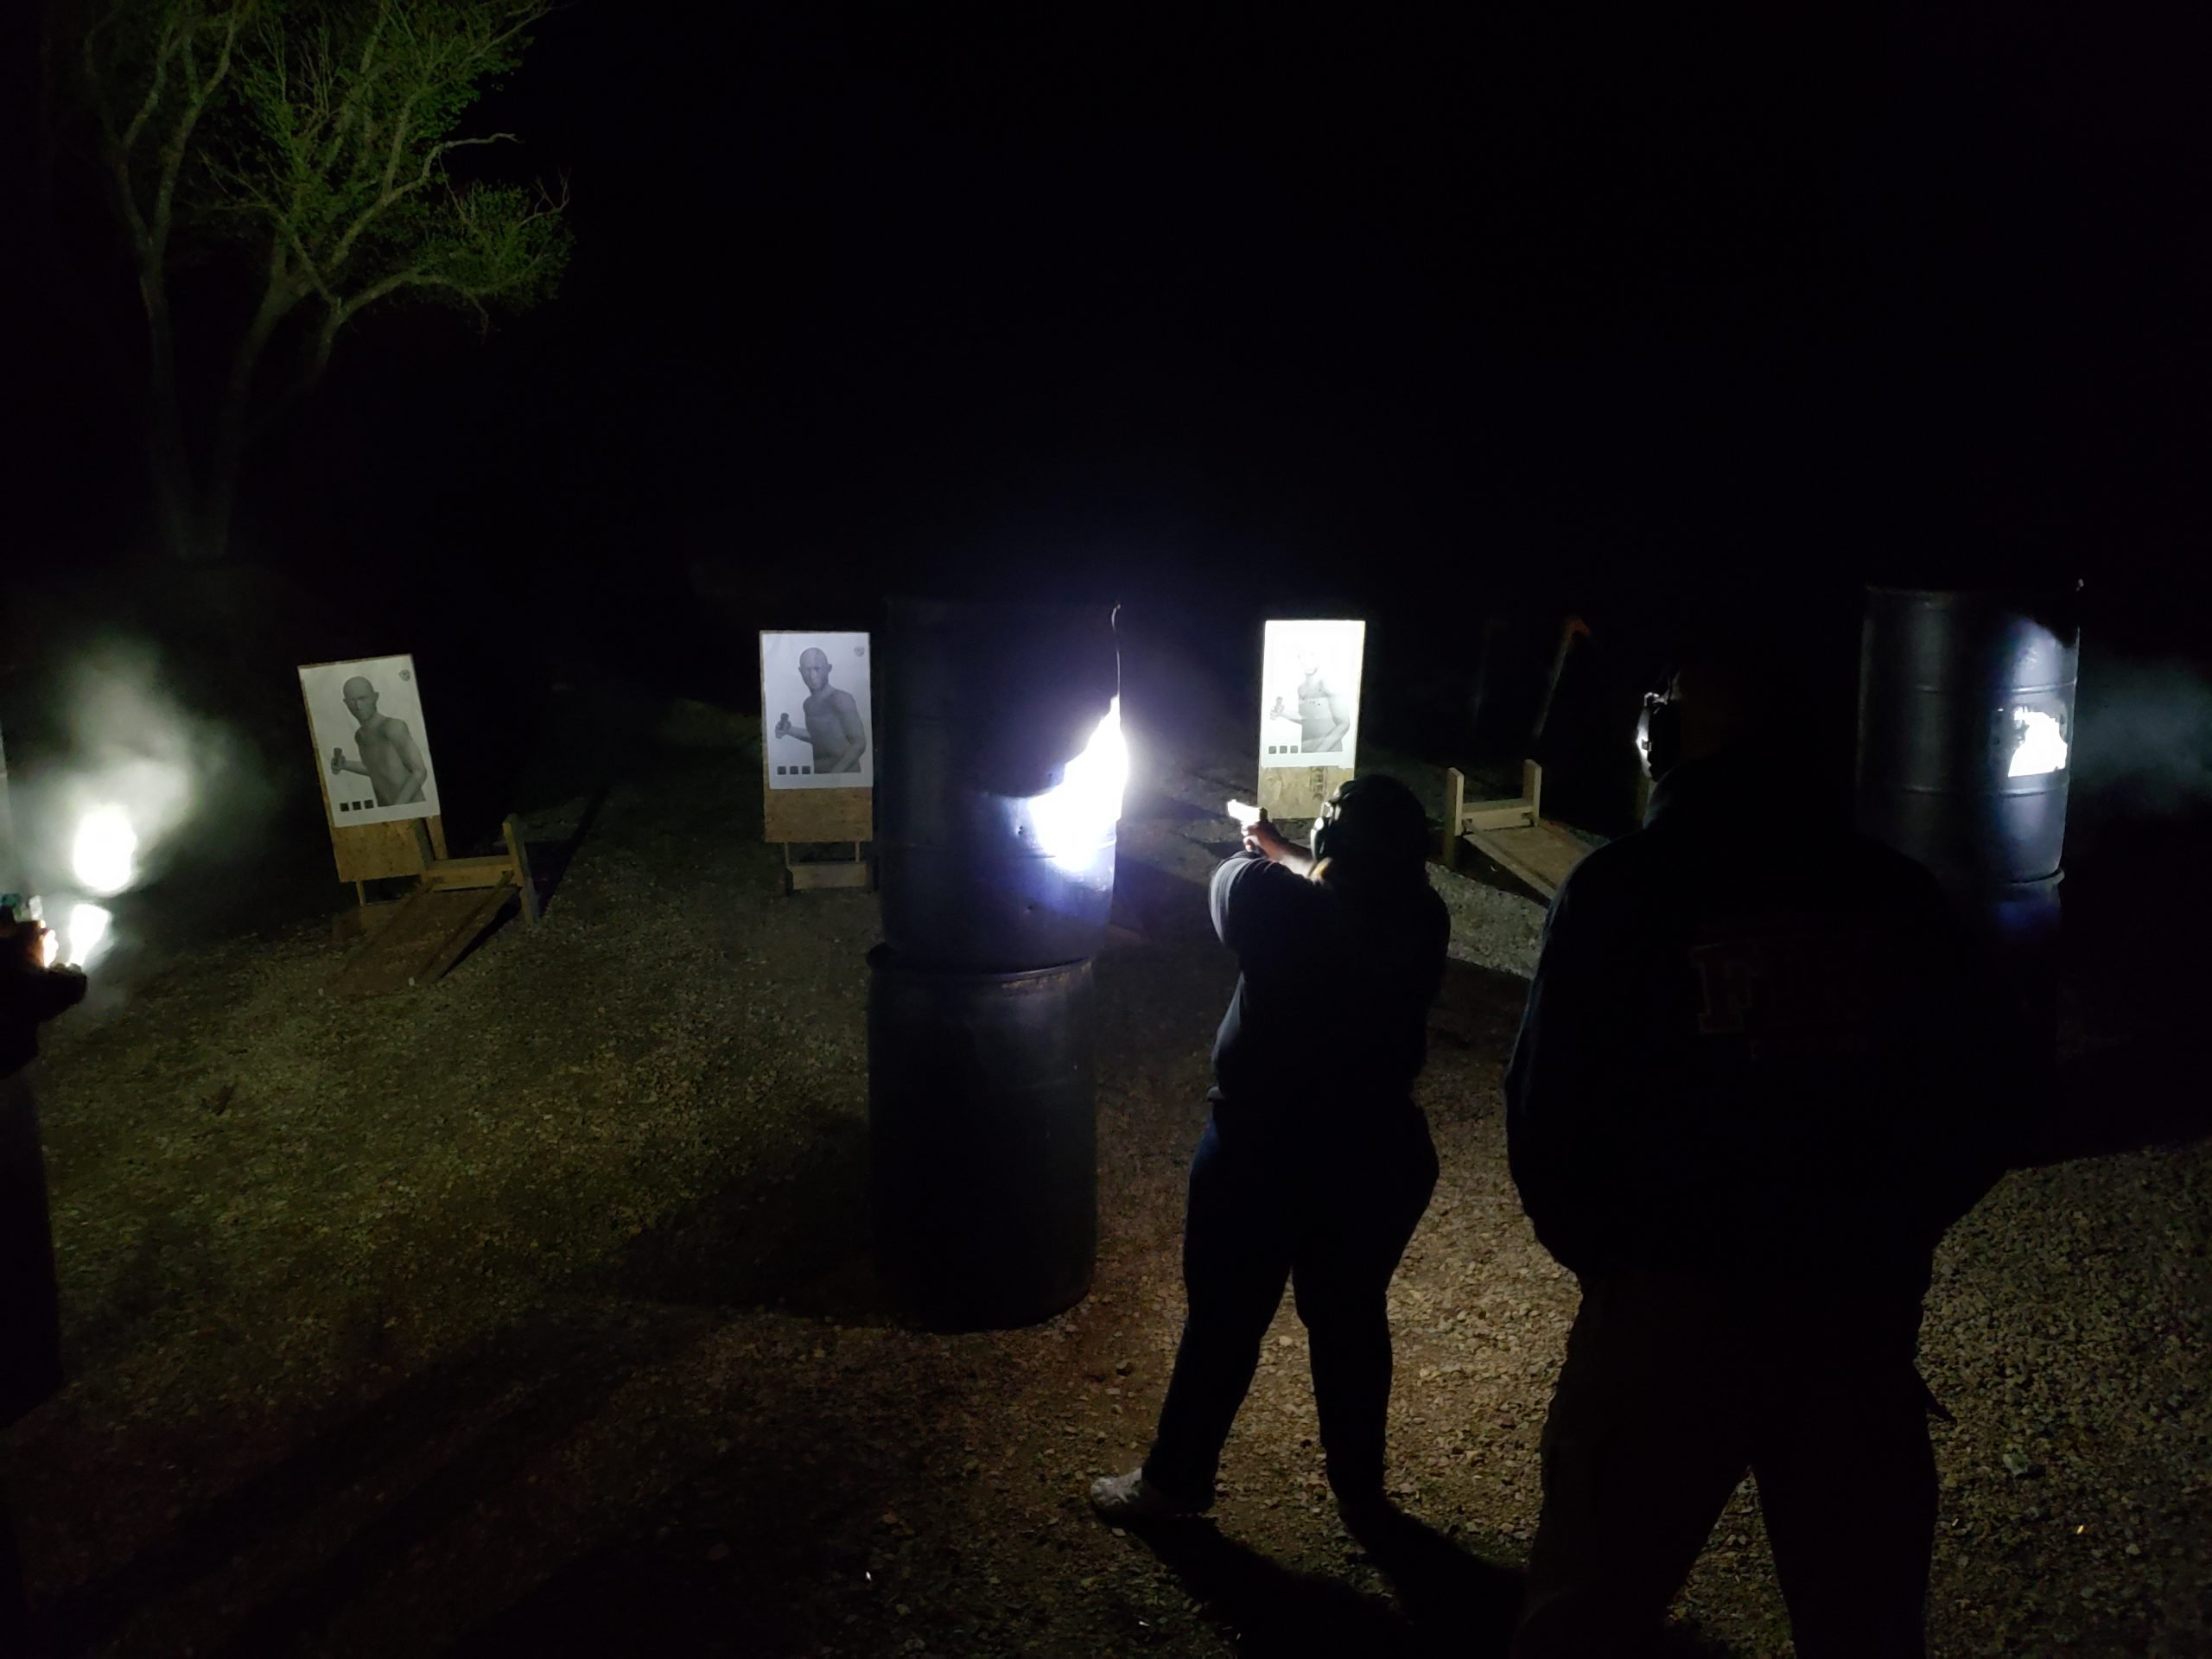 Agile Training & Consulting Low Light Pistol